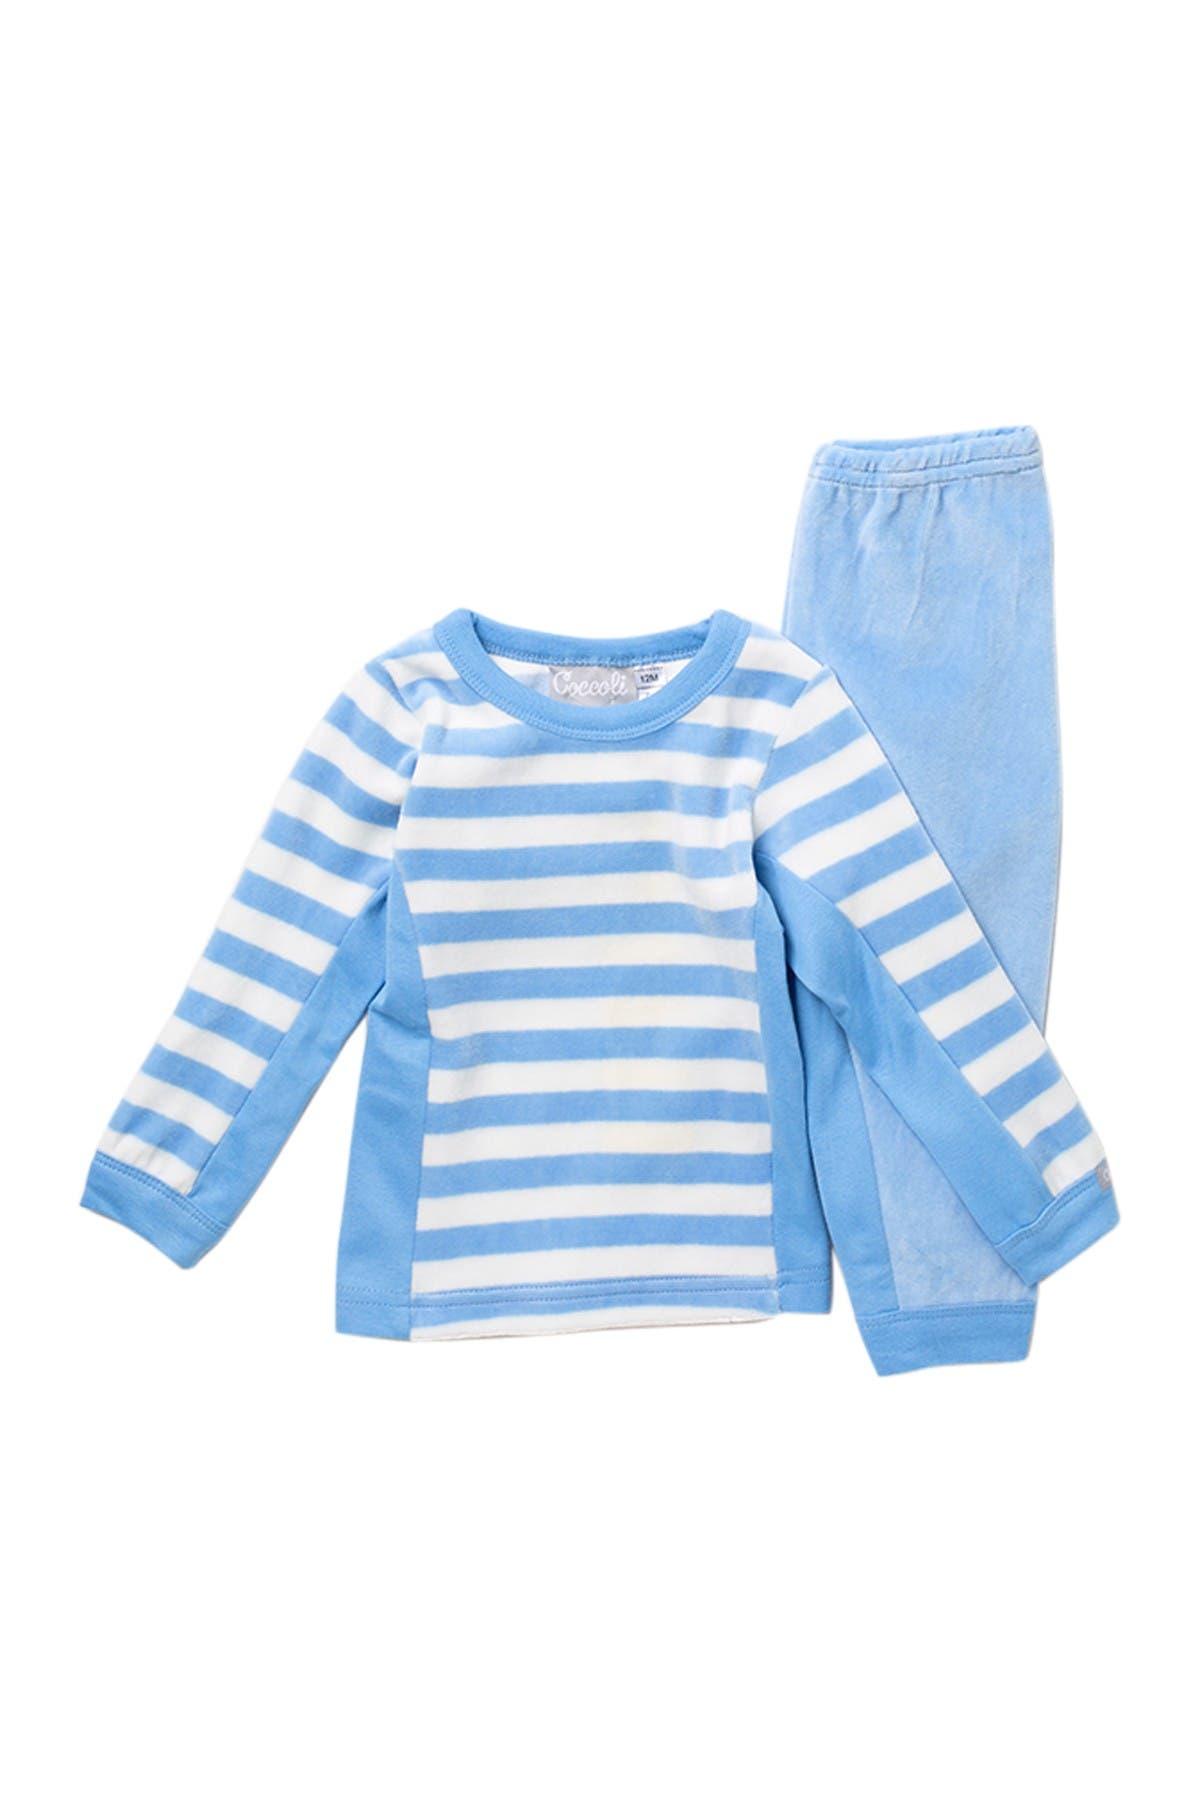 Image of Coccoli Velour Pajama Set